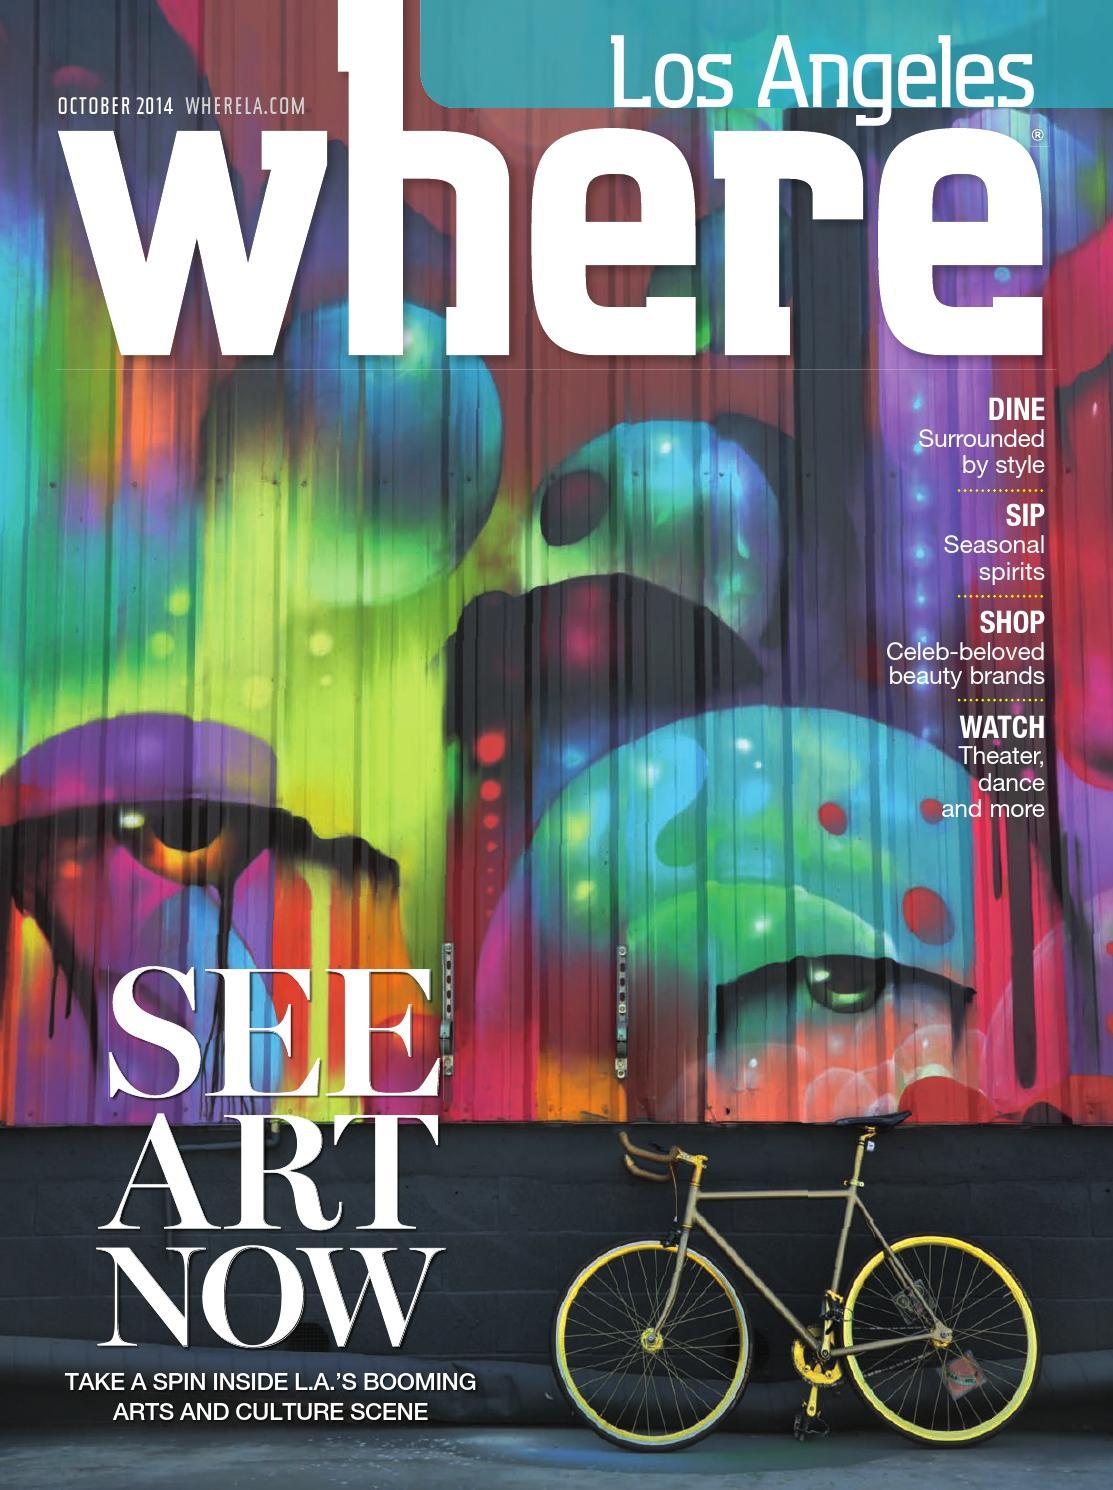 abd3284fb9416 WHERE Los Angeles Magazine October 2014 by SoCalMedia - issuu